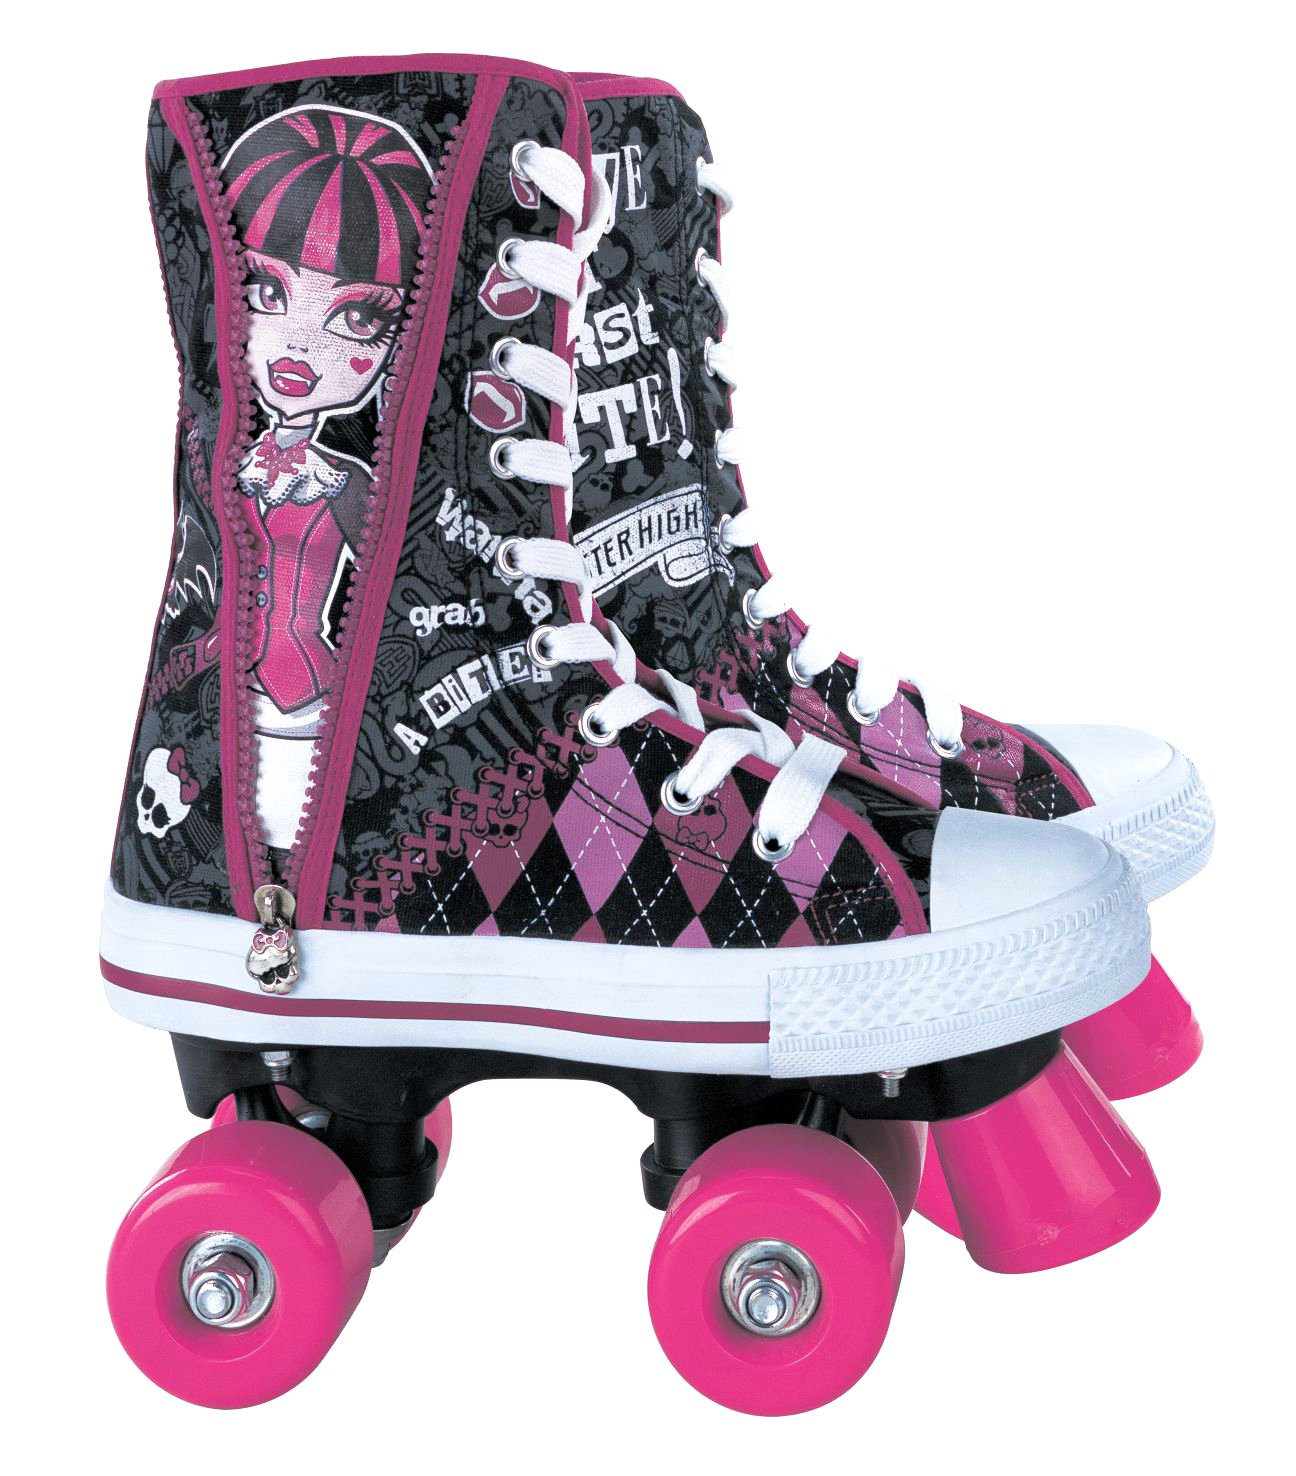 Monster High Stamp - MO130350 - Vélo et Véhicule pour Enfant - Bootskates - Taille 34 product image